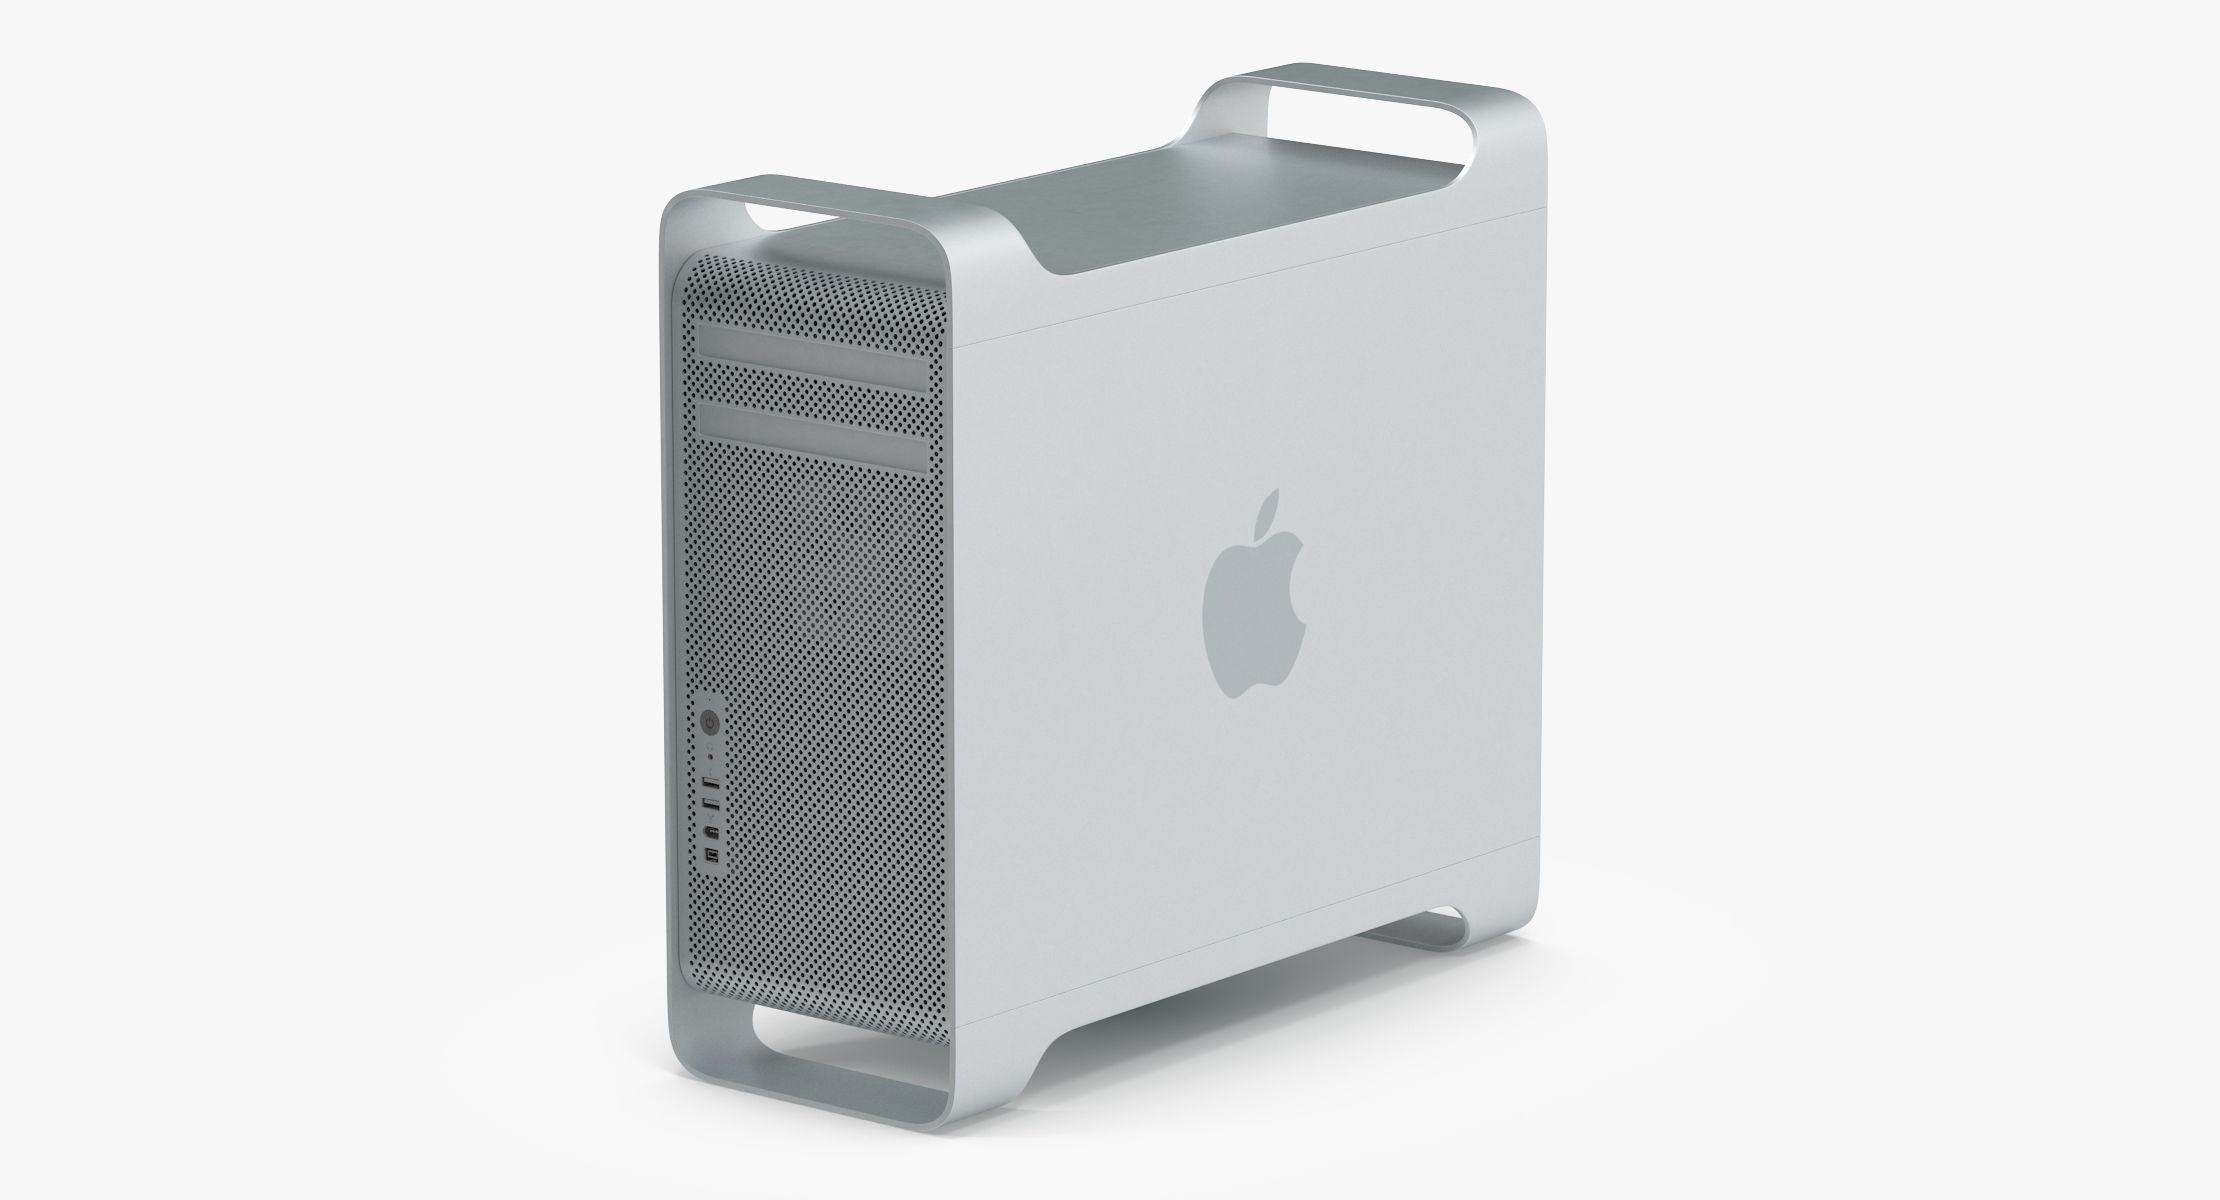 Mac Pro Tower - reel 1